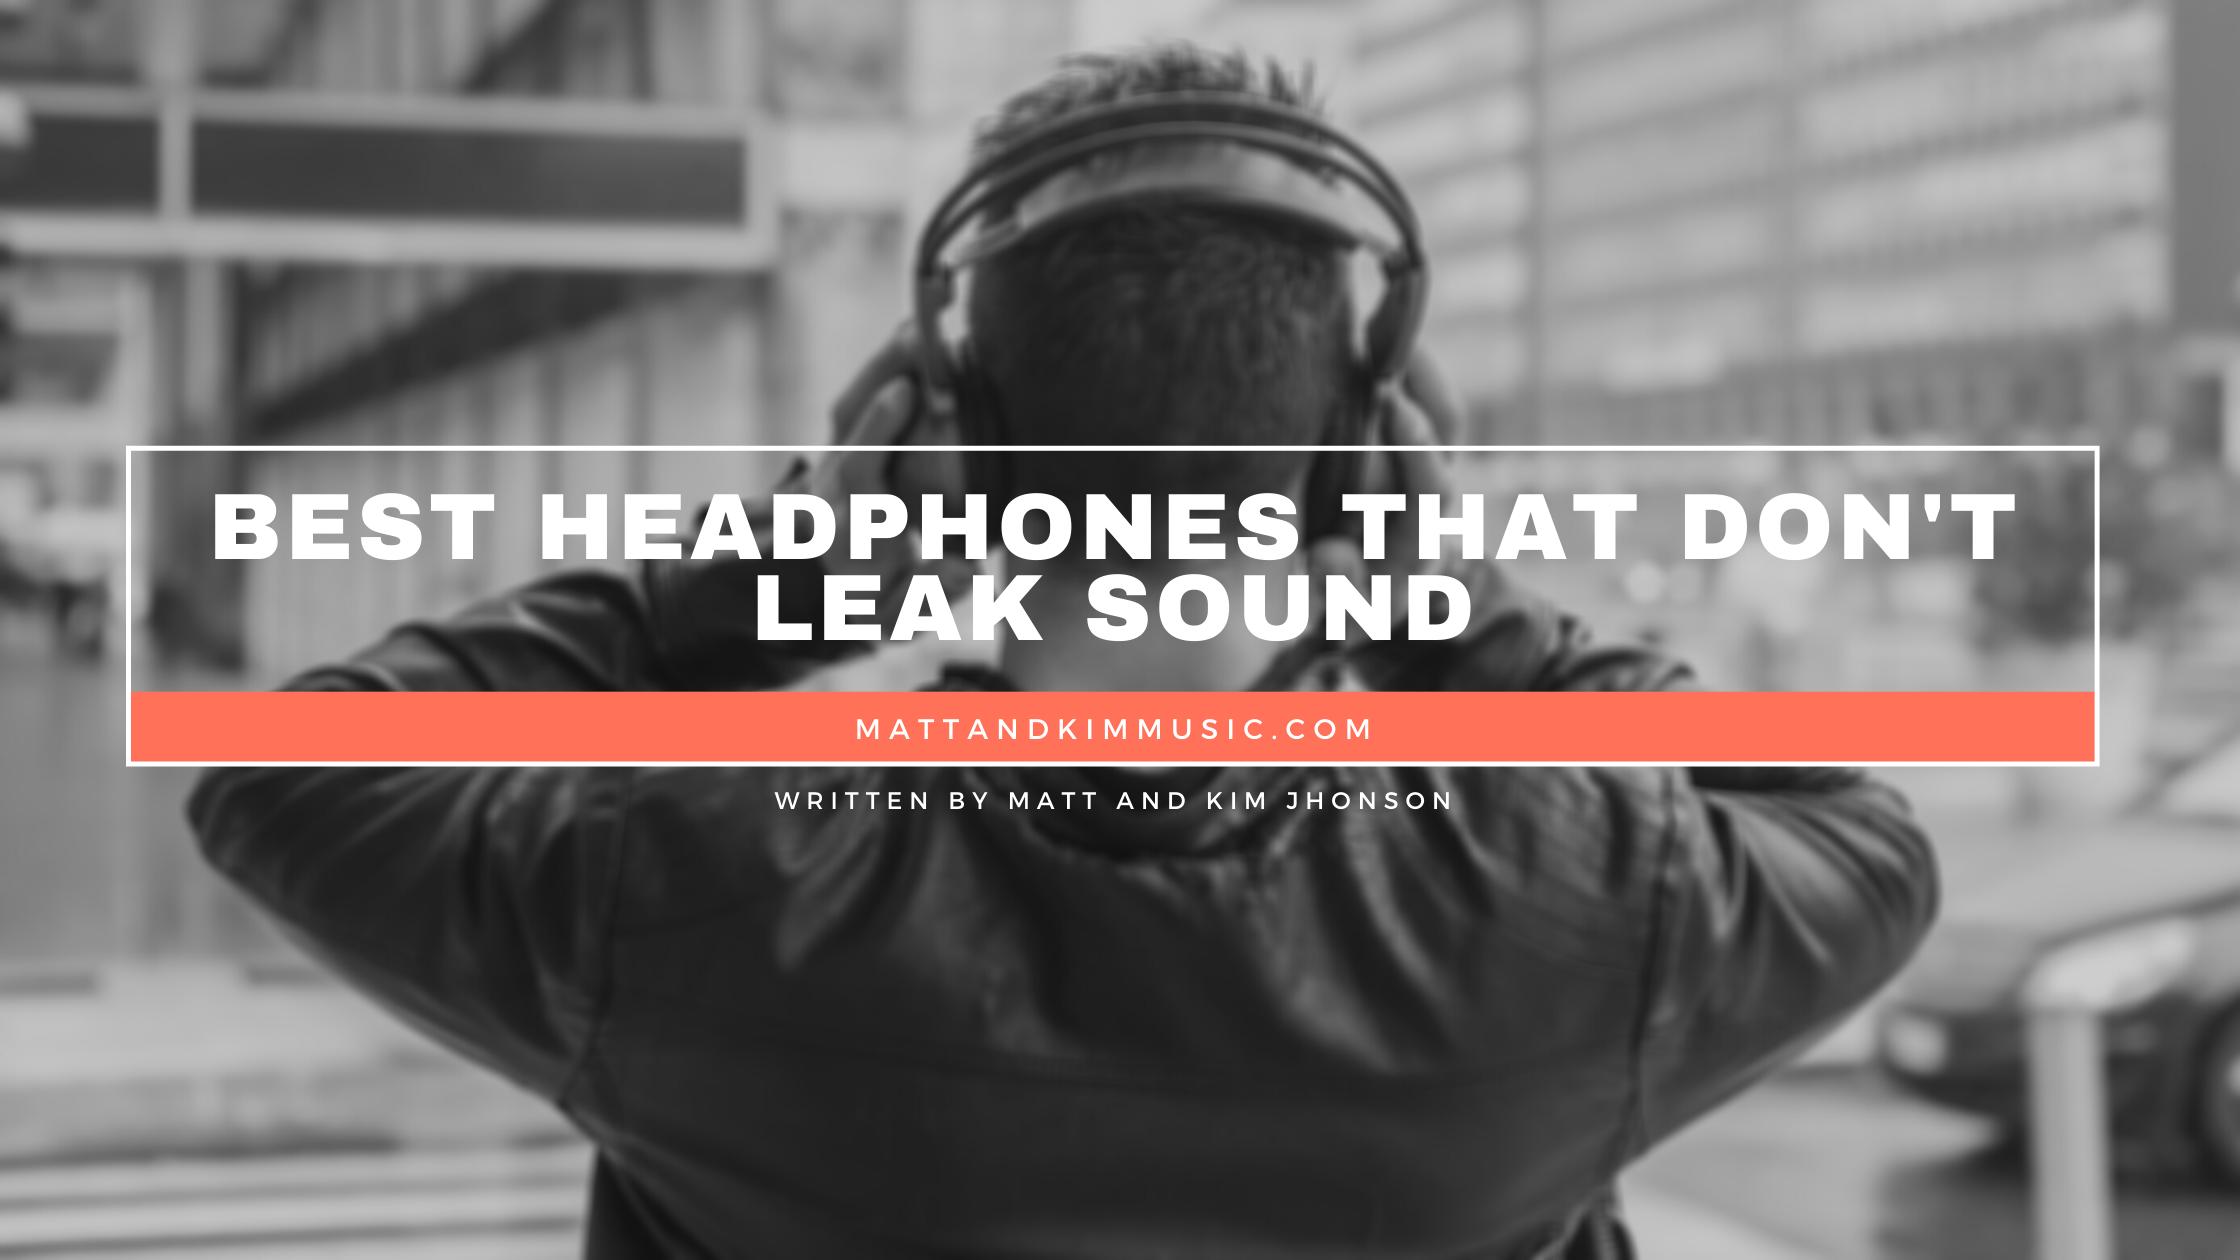 best headphones that don't leak sound